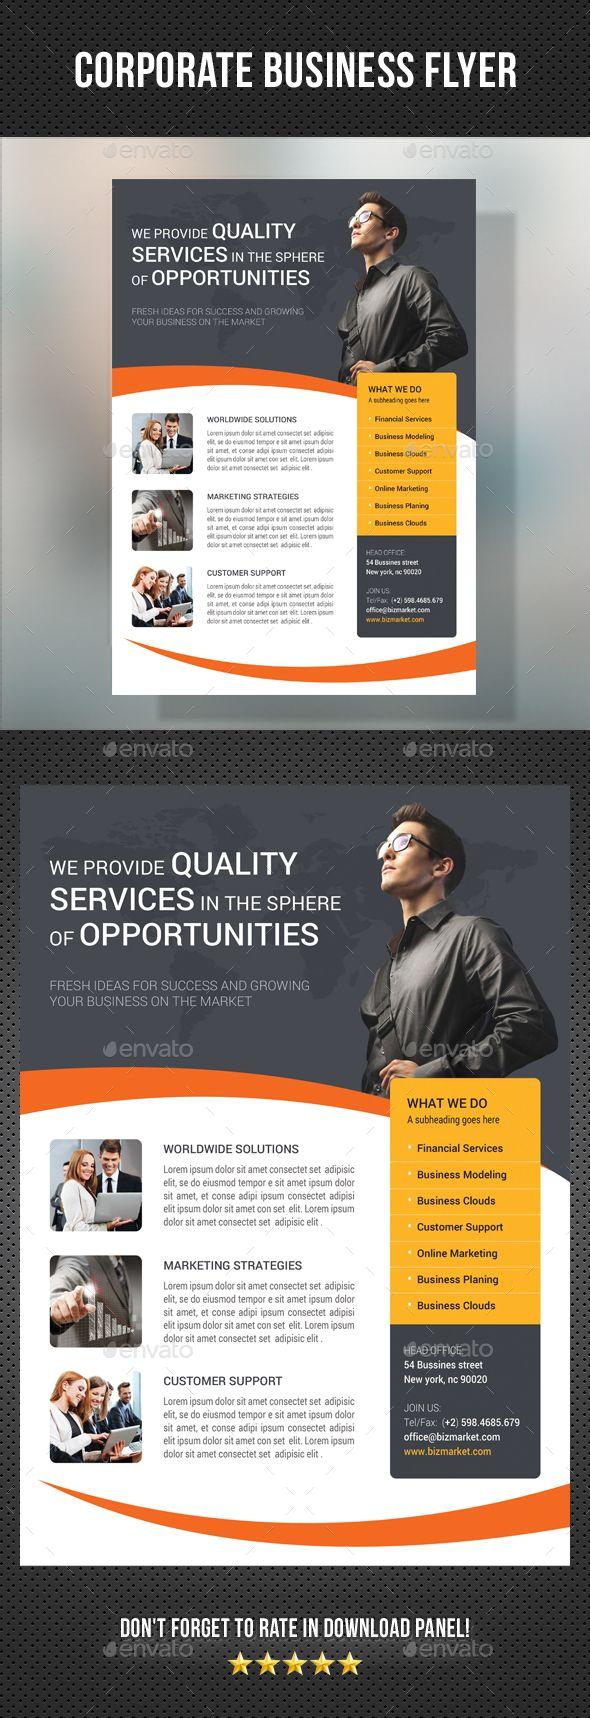 Corporate Business Flyer Template Psd Flyer Templates Pinterest